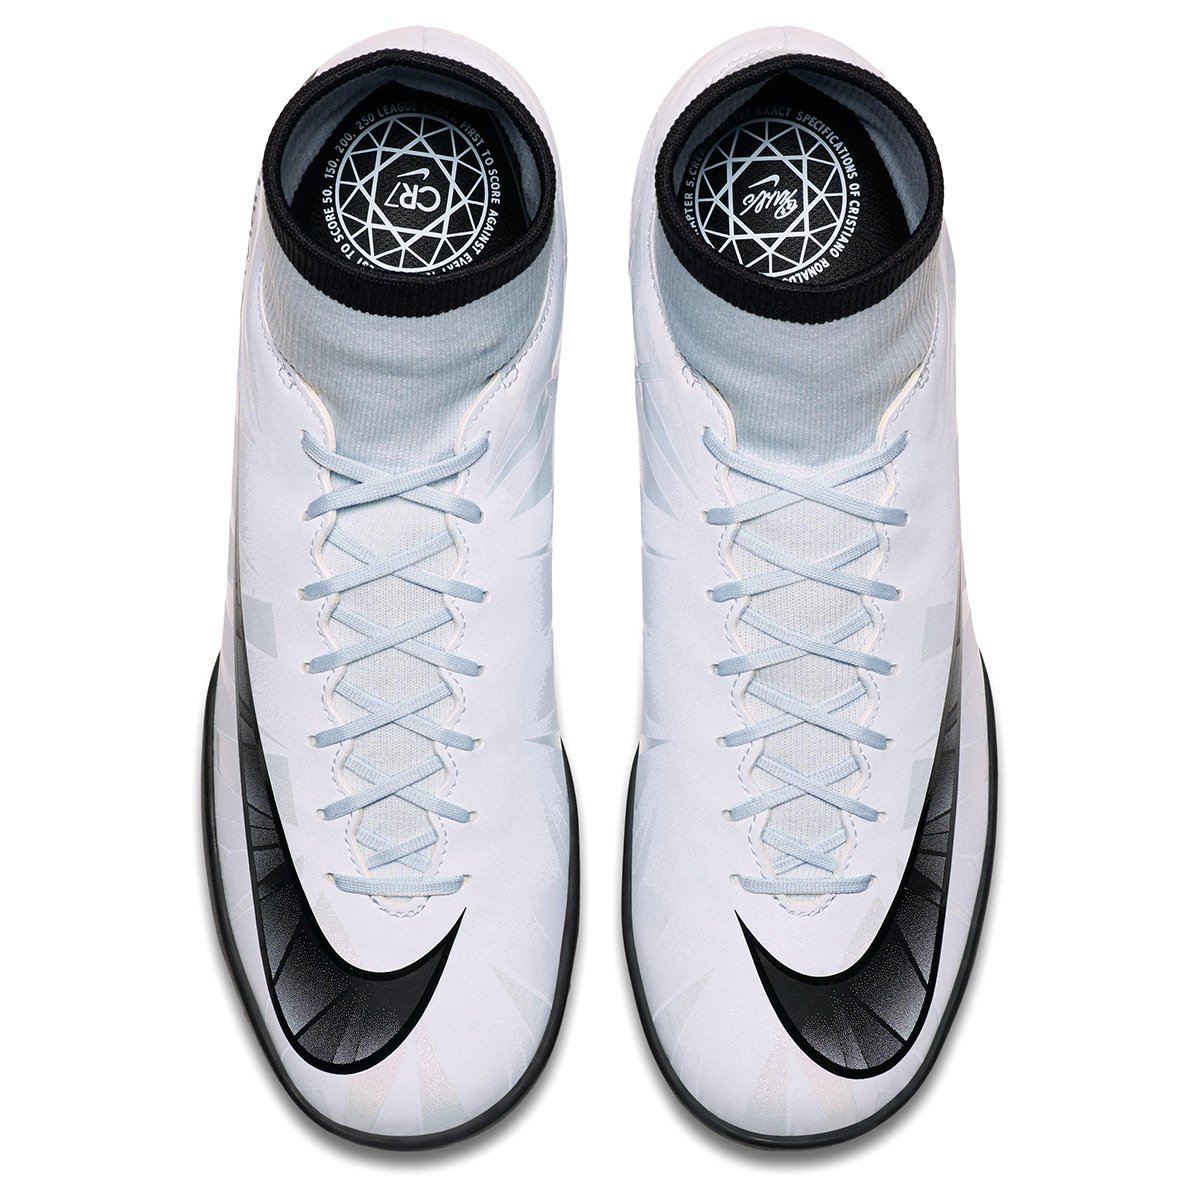 4fc1dfa40f Chuteira Society Nike Mercurial Victory 6 CR7 DF TF